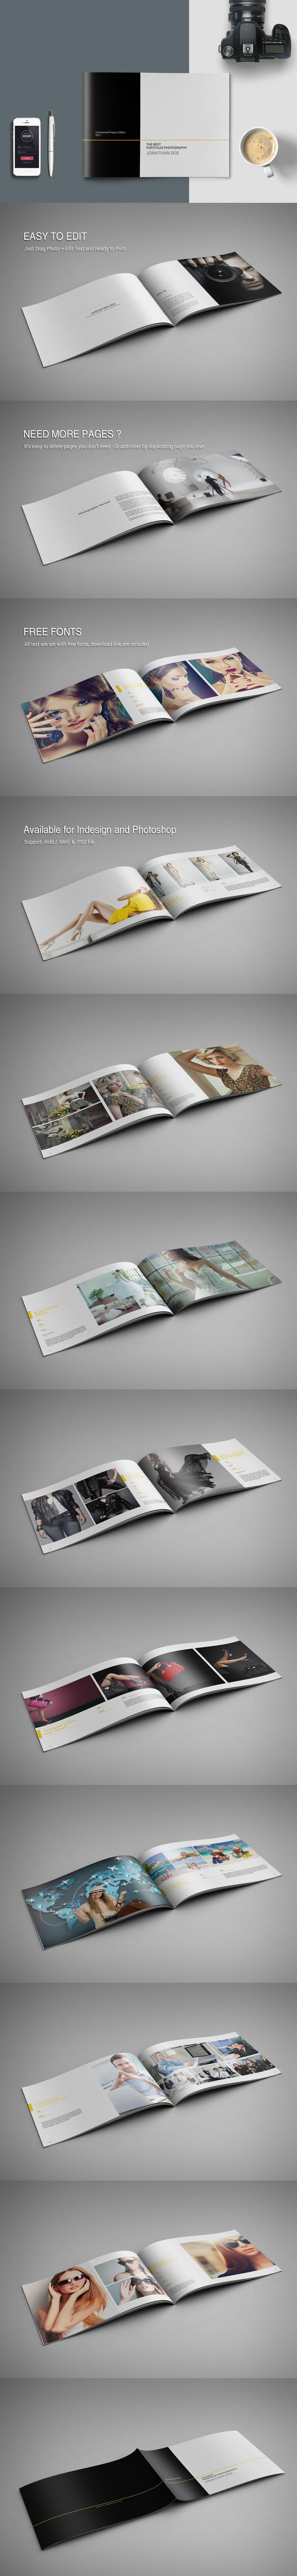 Photography Portfolio Brochure Template InDesign INDD | Brochure ...